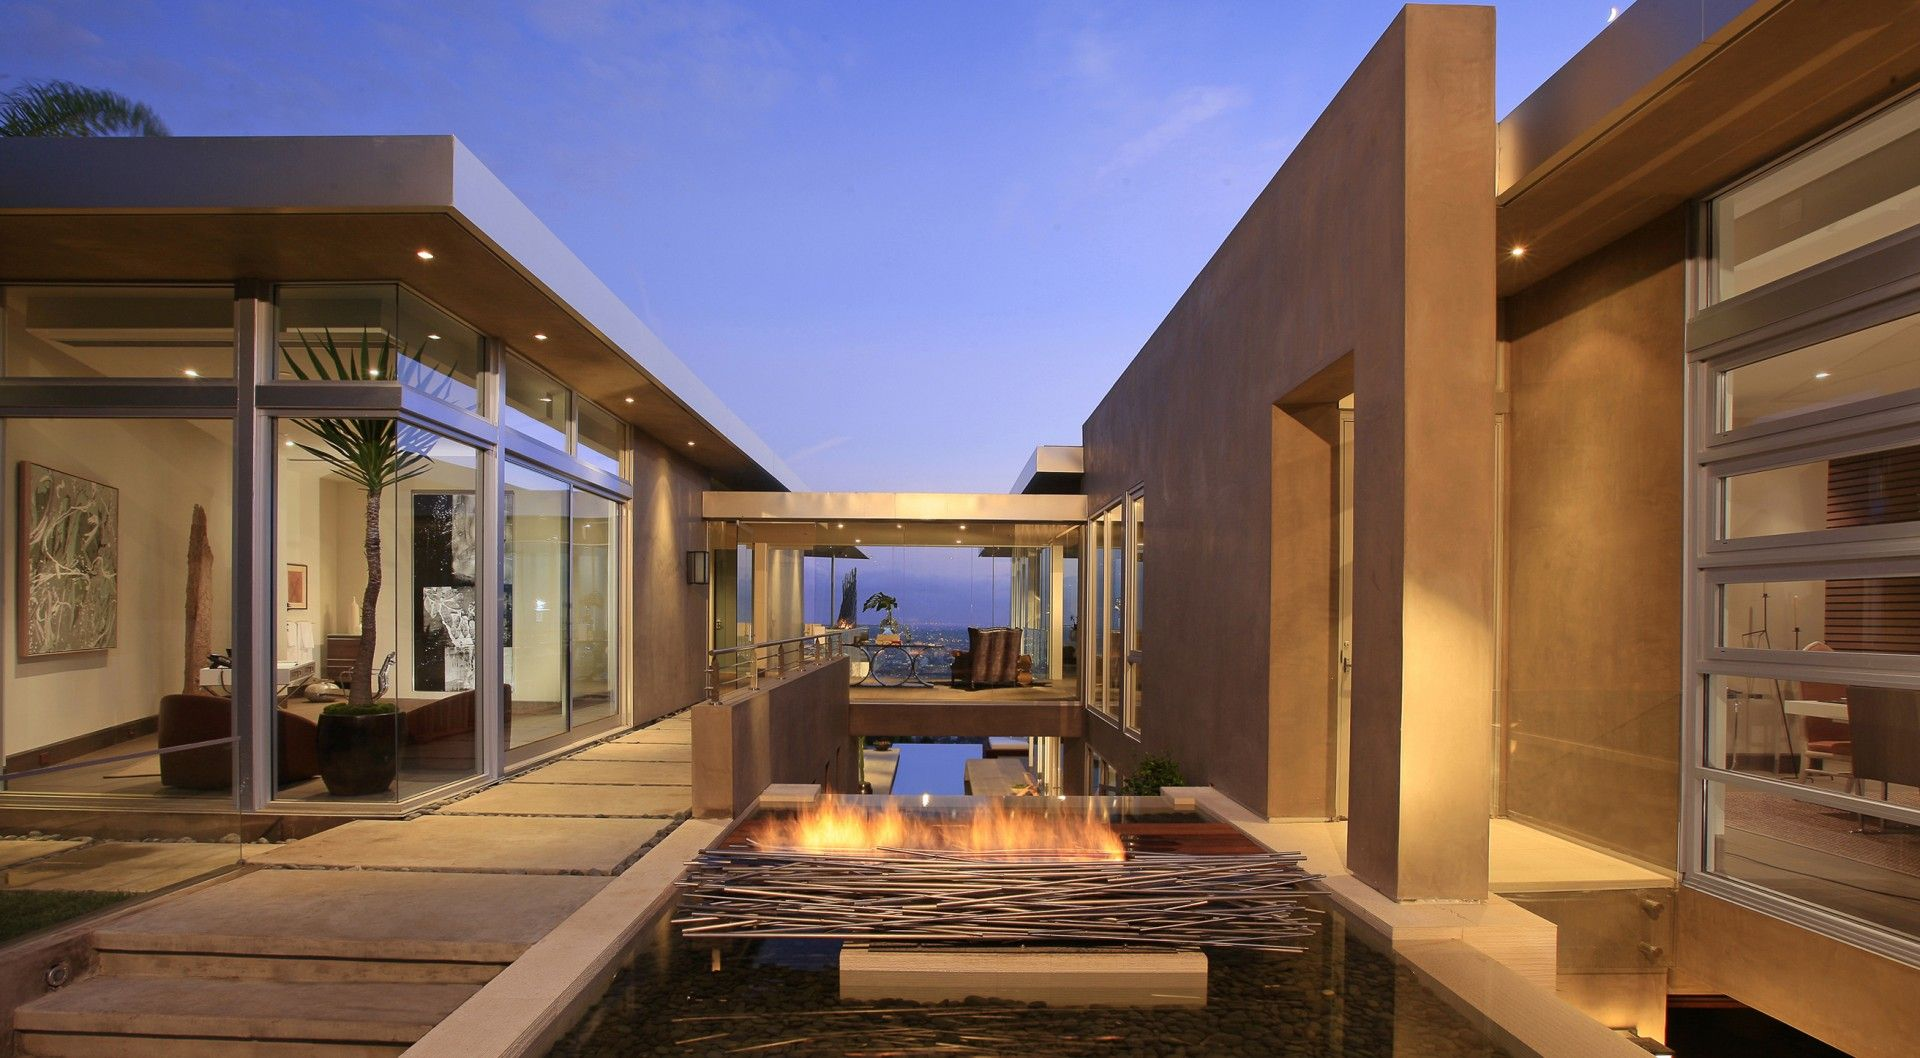 Los Angeles Architect House Design